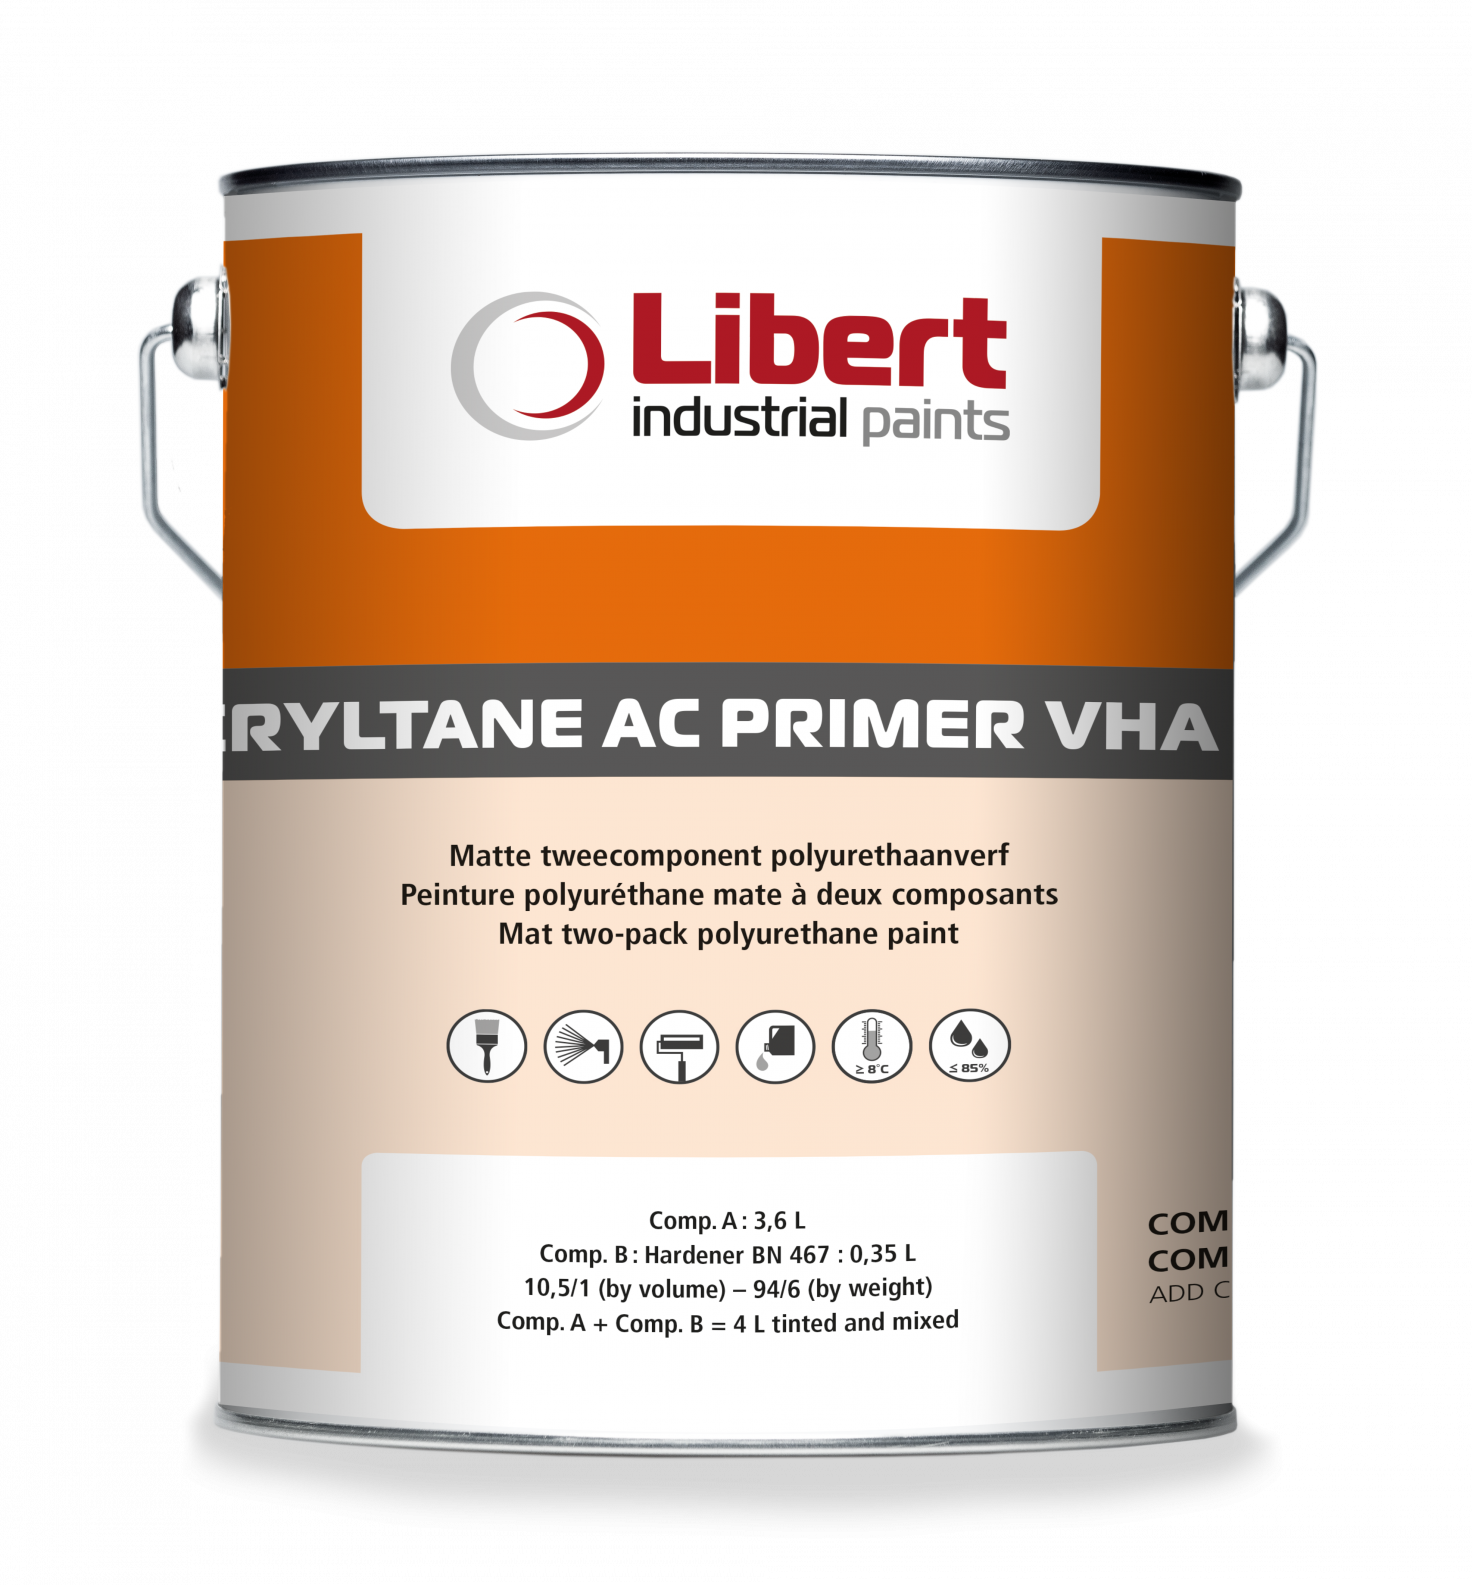 Cryltane AC Primer VHA 006.png